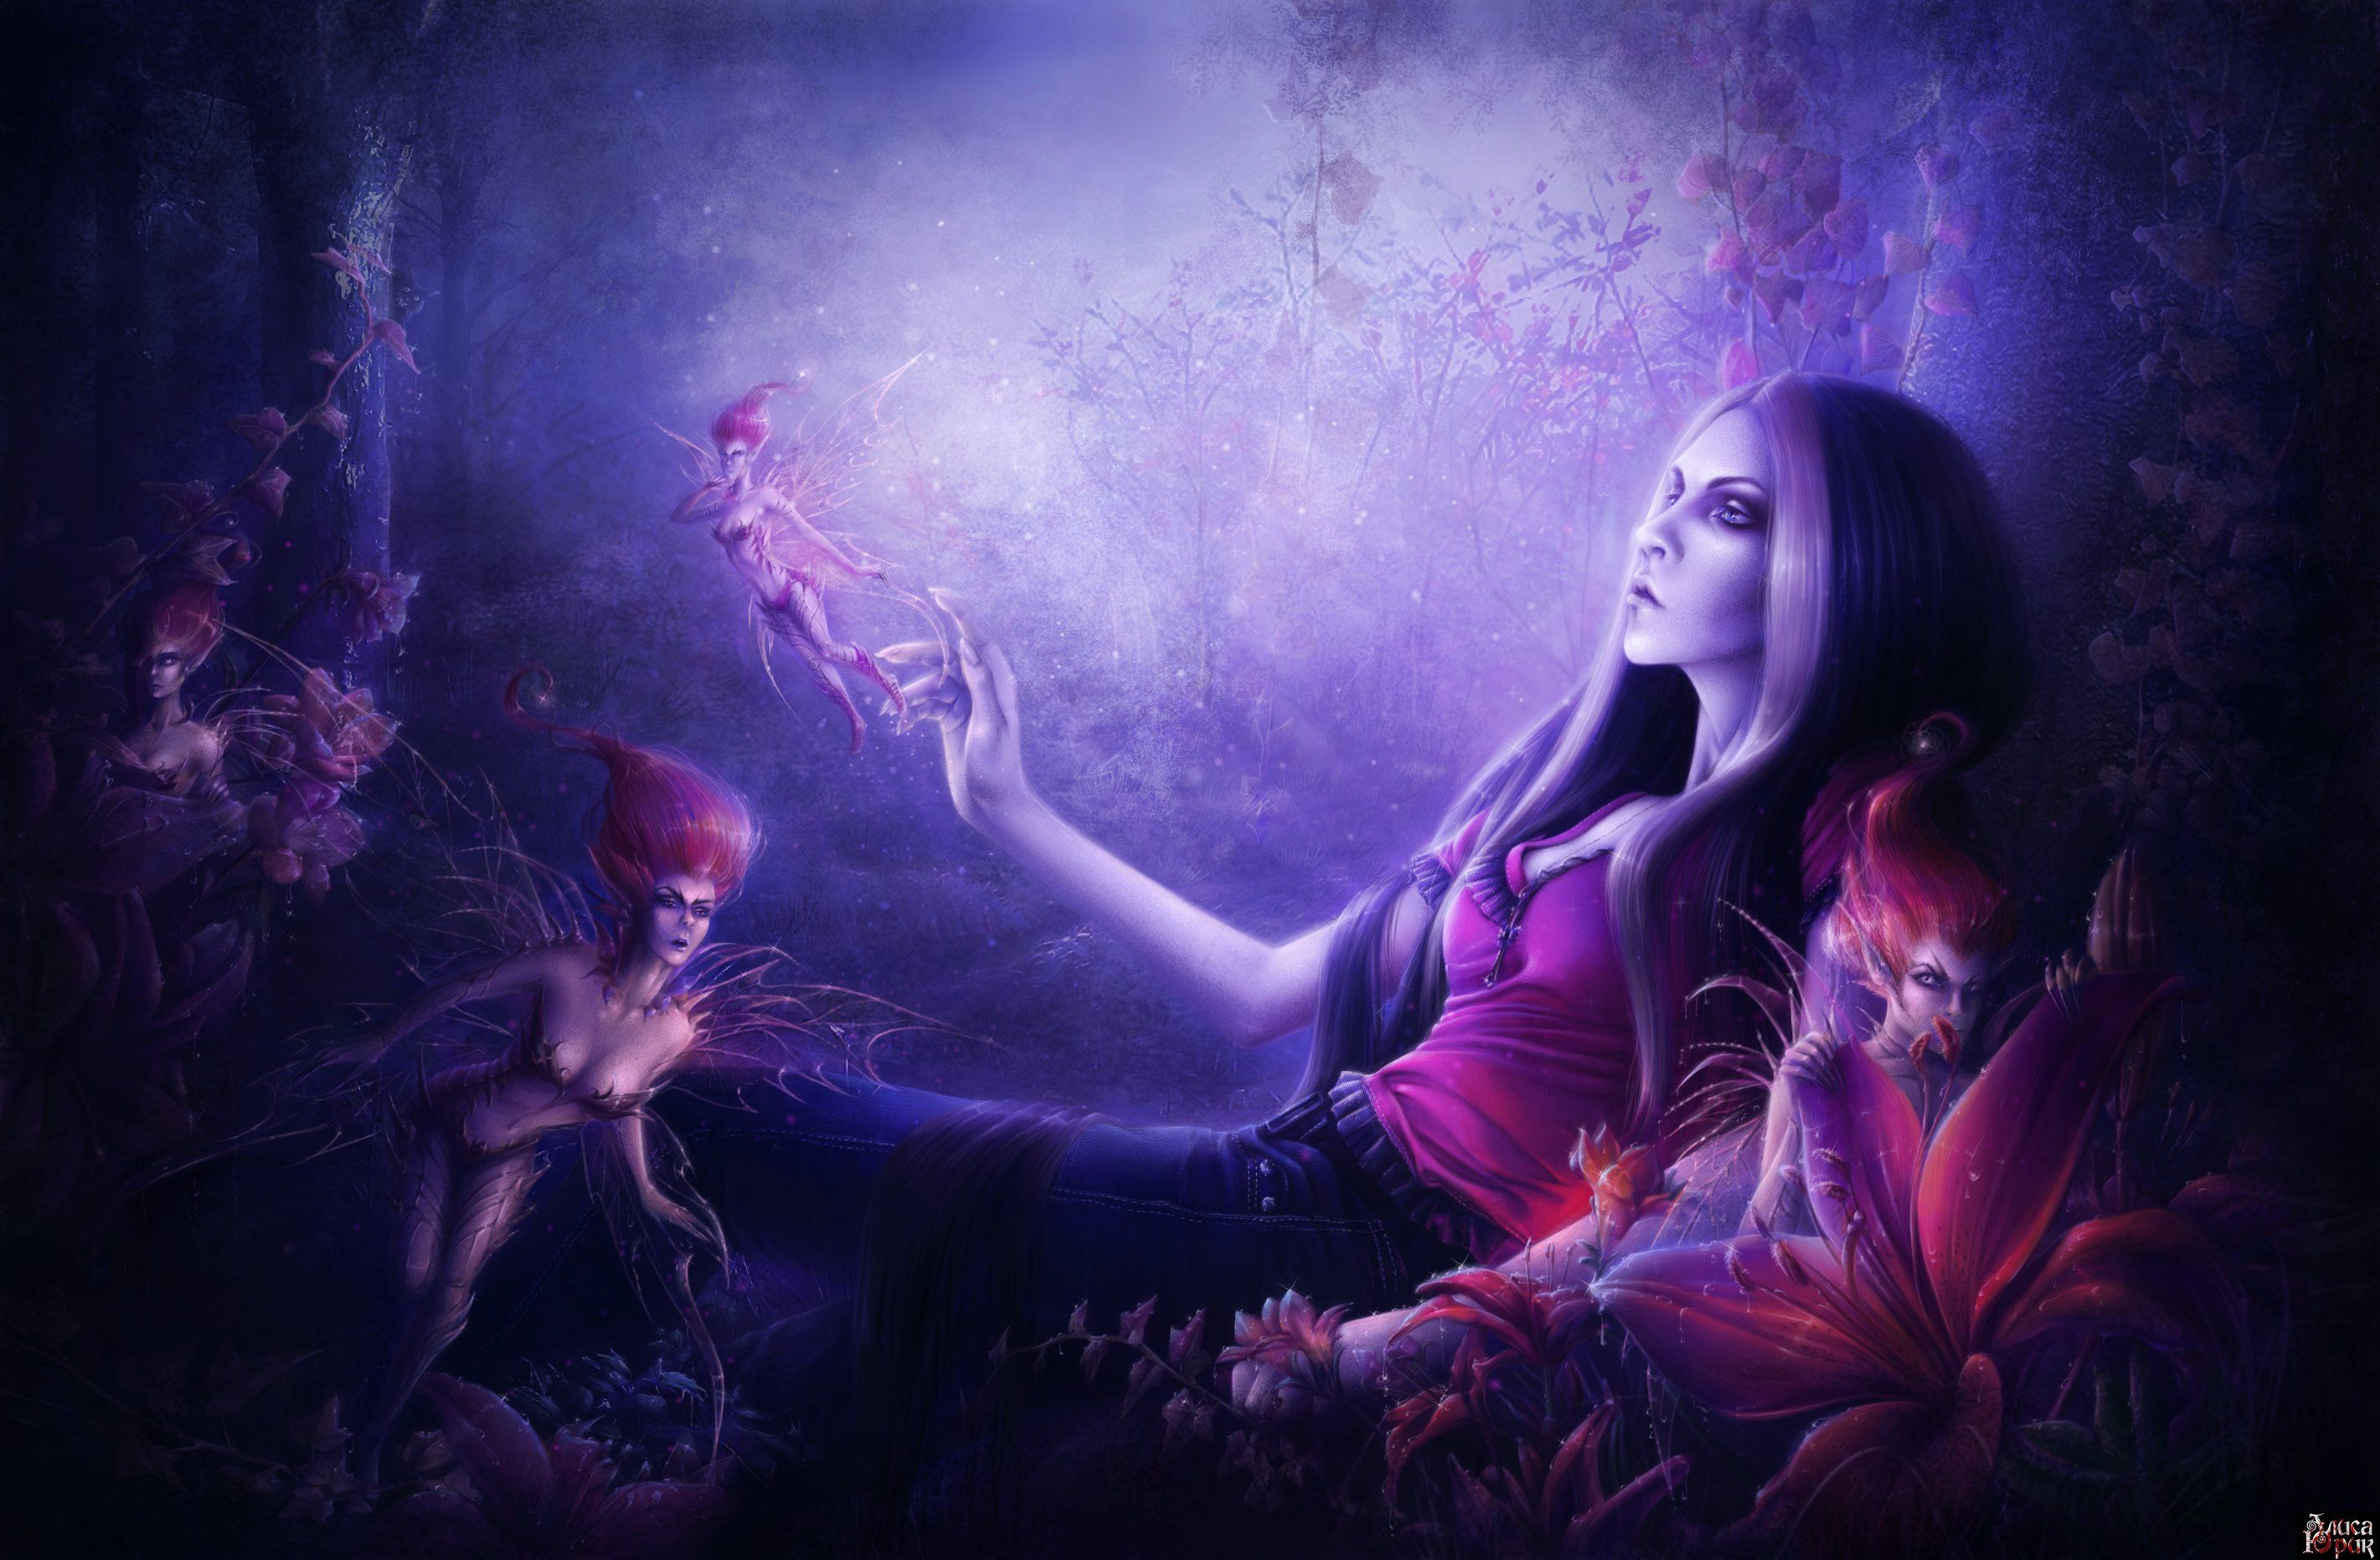 Best Wallpaper Night Fairy - d81685e273ea580e24d414dffdaa0448  Snapshot-78155.jpg